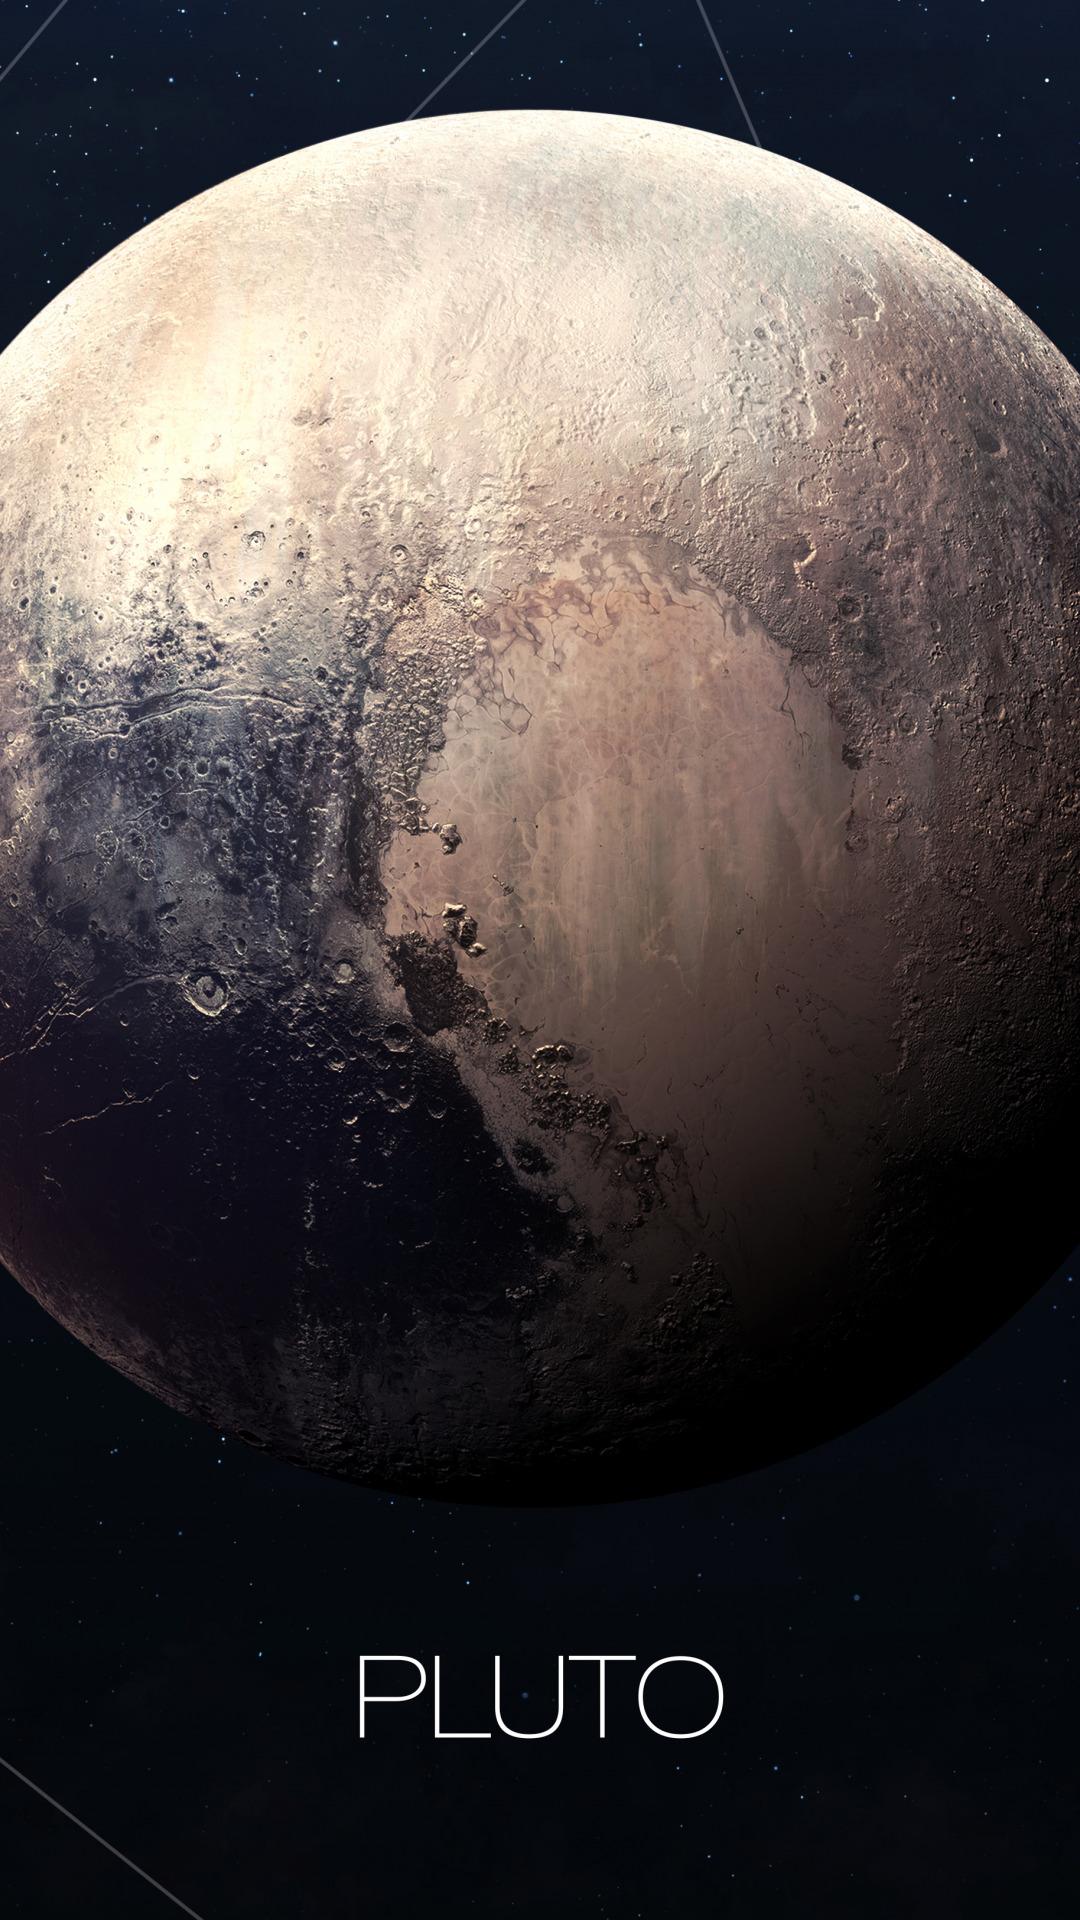 pluto planet cartoon - HD1080×1920